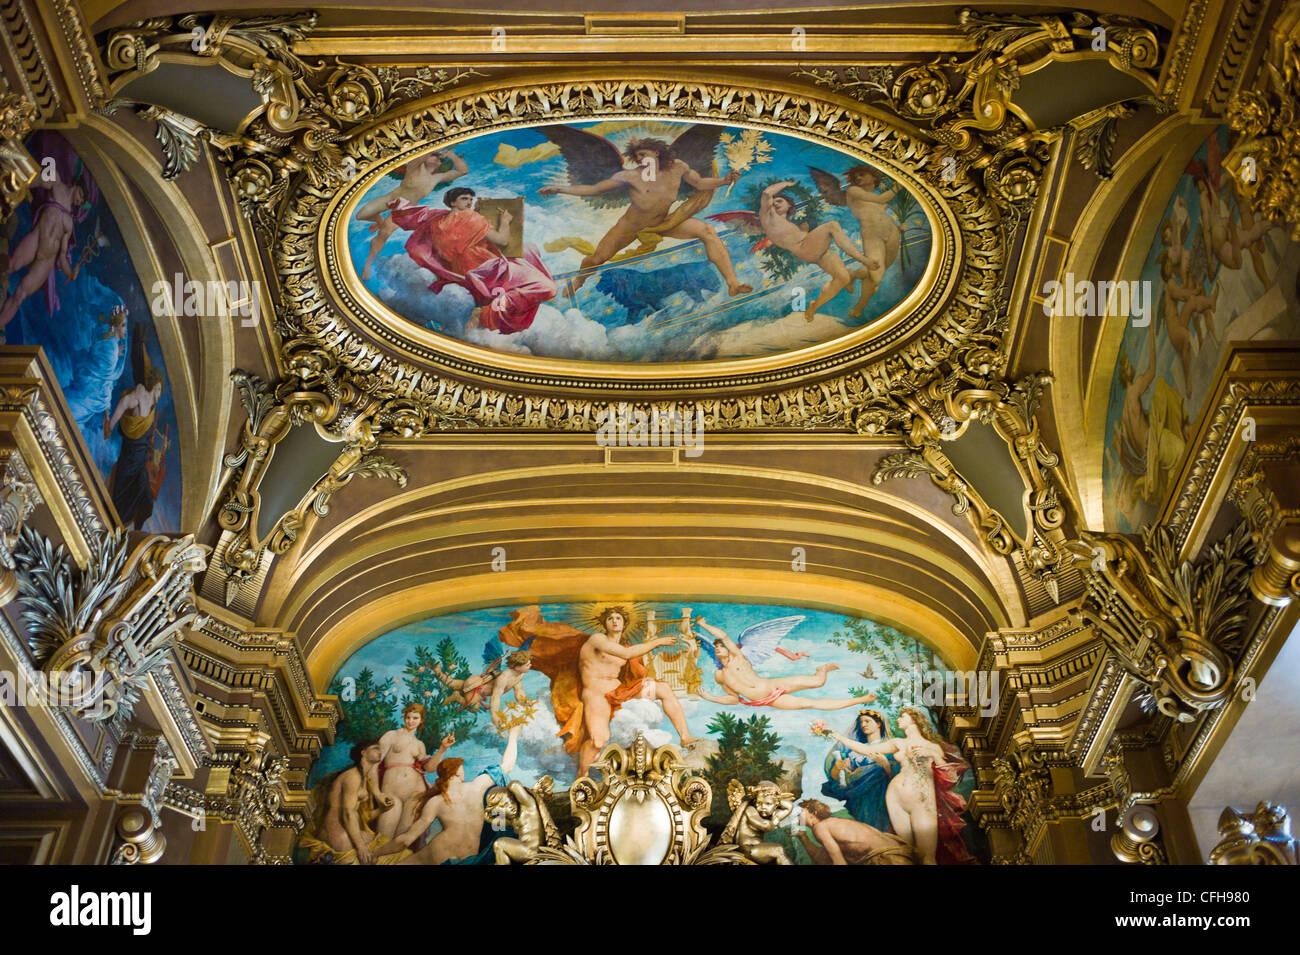 France, Paris, Opéra Palais Garnier, the ceiling - Stock Image